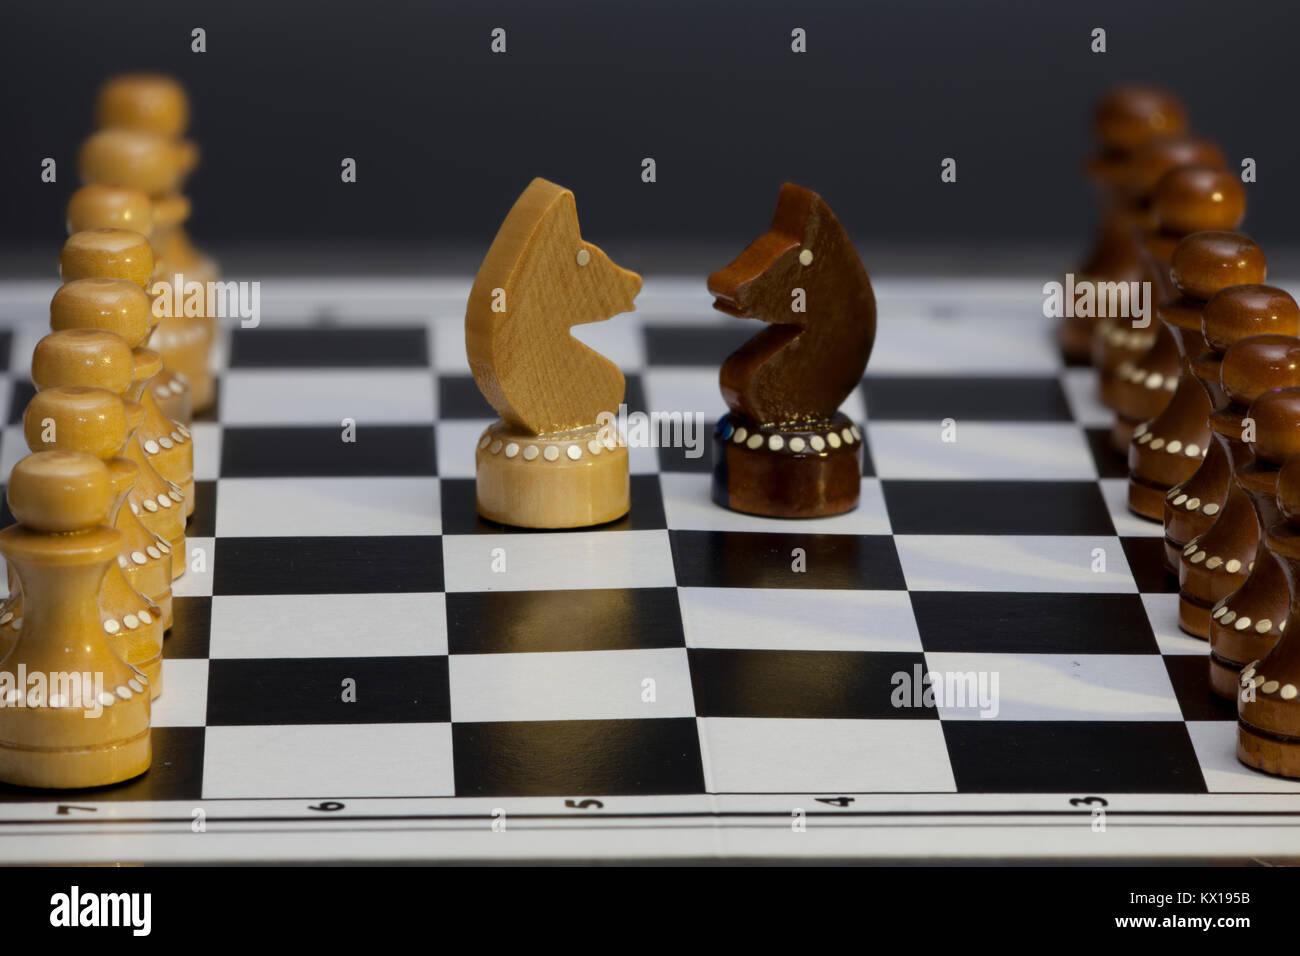 Caballero Ajedrez enfrentamiento cabeza a cabeza, figuras de ajedrez sobre un tablero de ajedrez Imagen De Stock